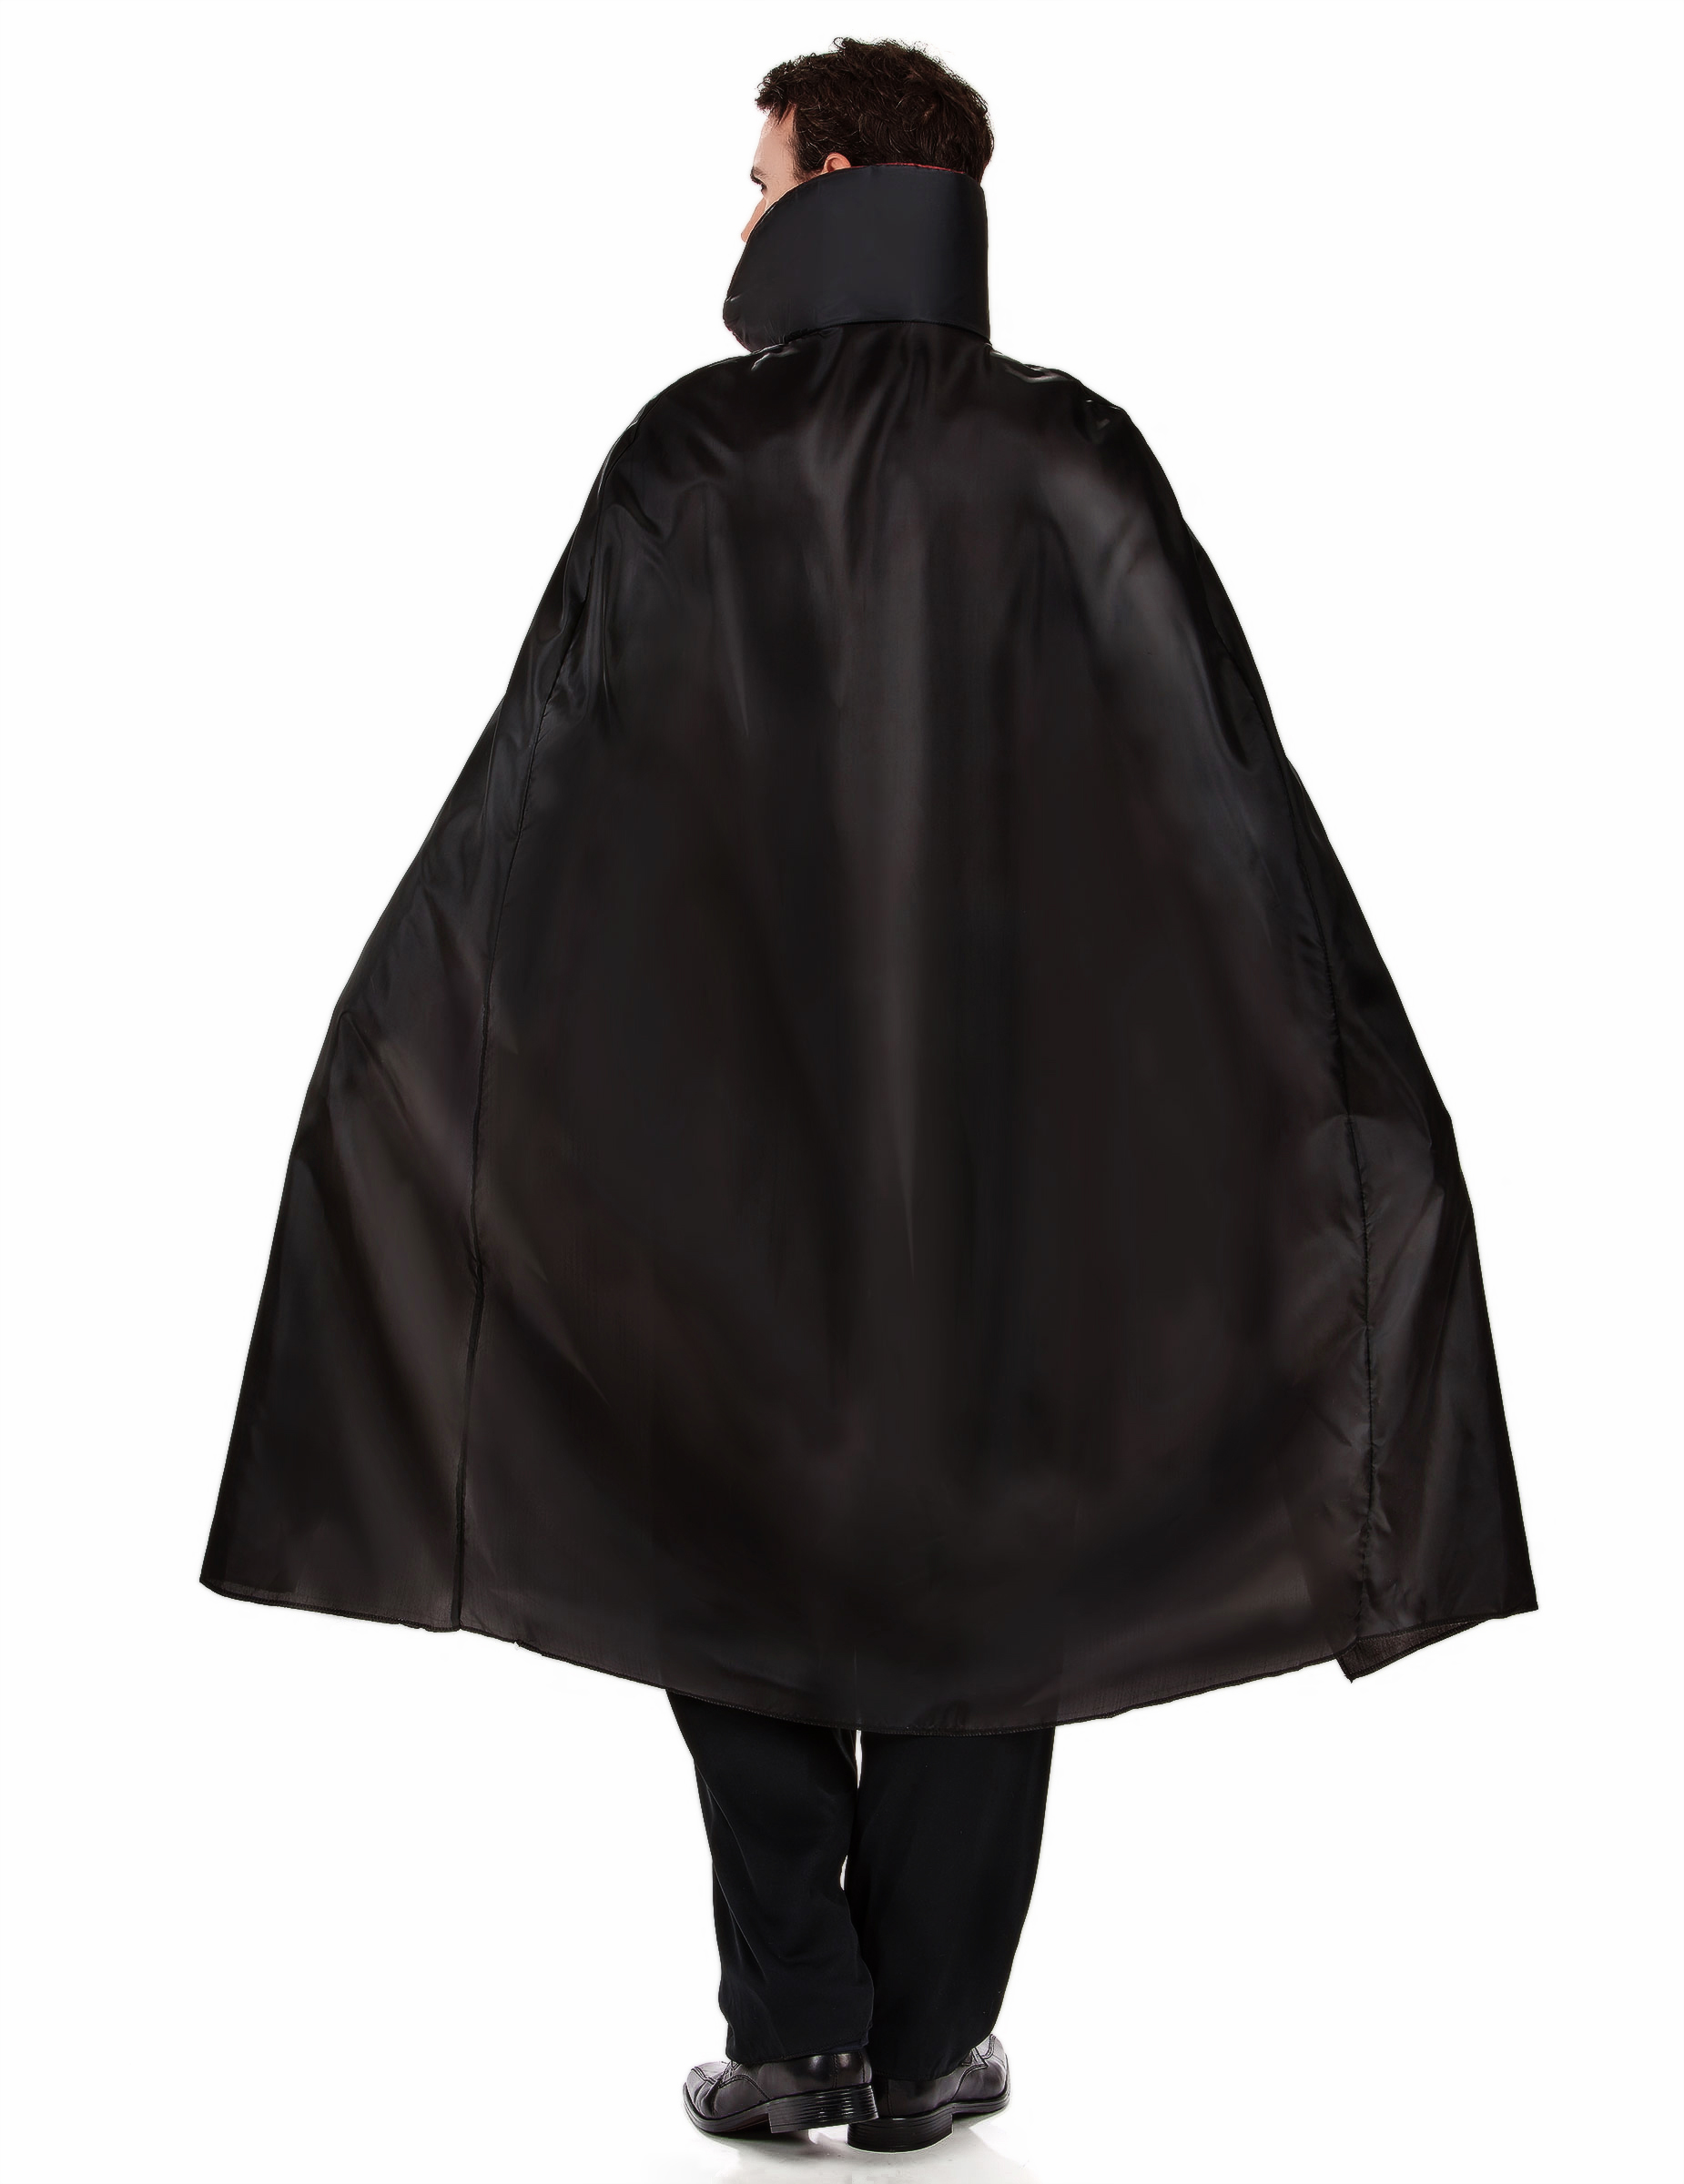 Trucco Halloween Vampiro Uomo.Travestimento Da Vampiro Uomo Per Halloween Su Vegaooparty Negozio